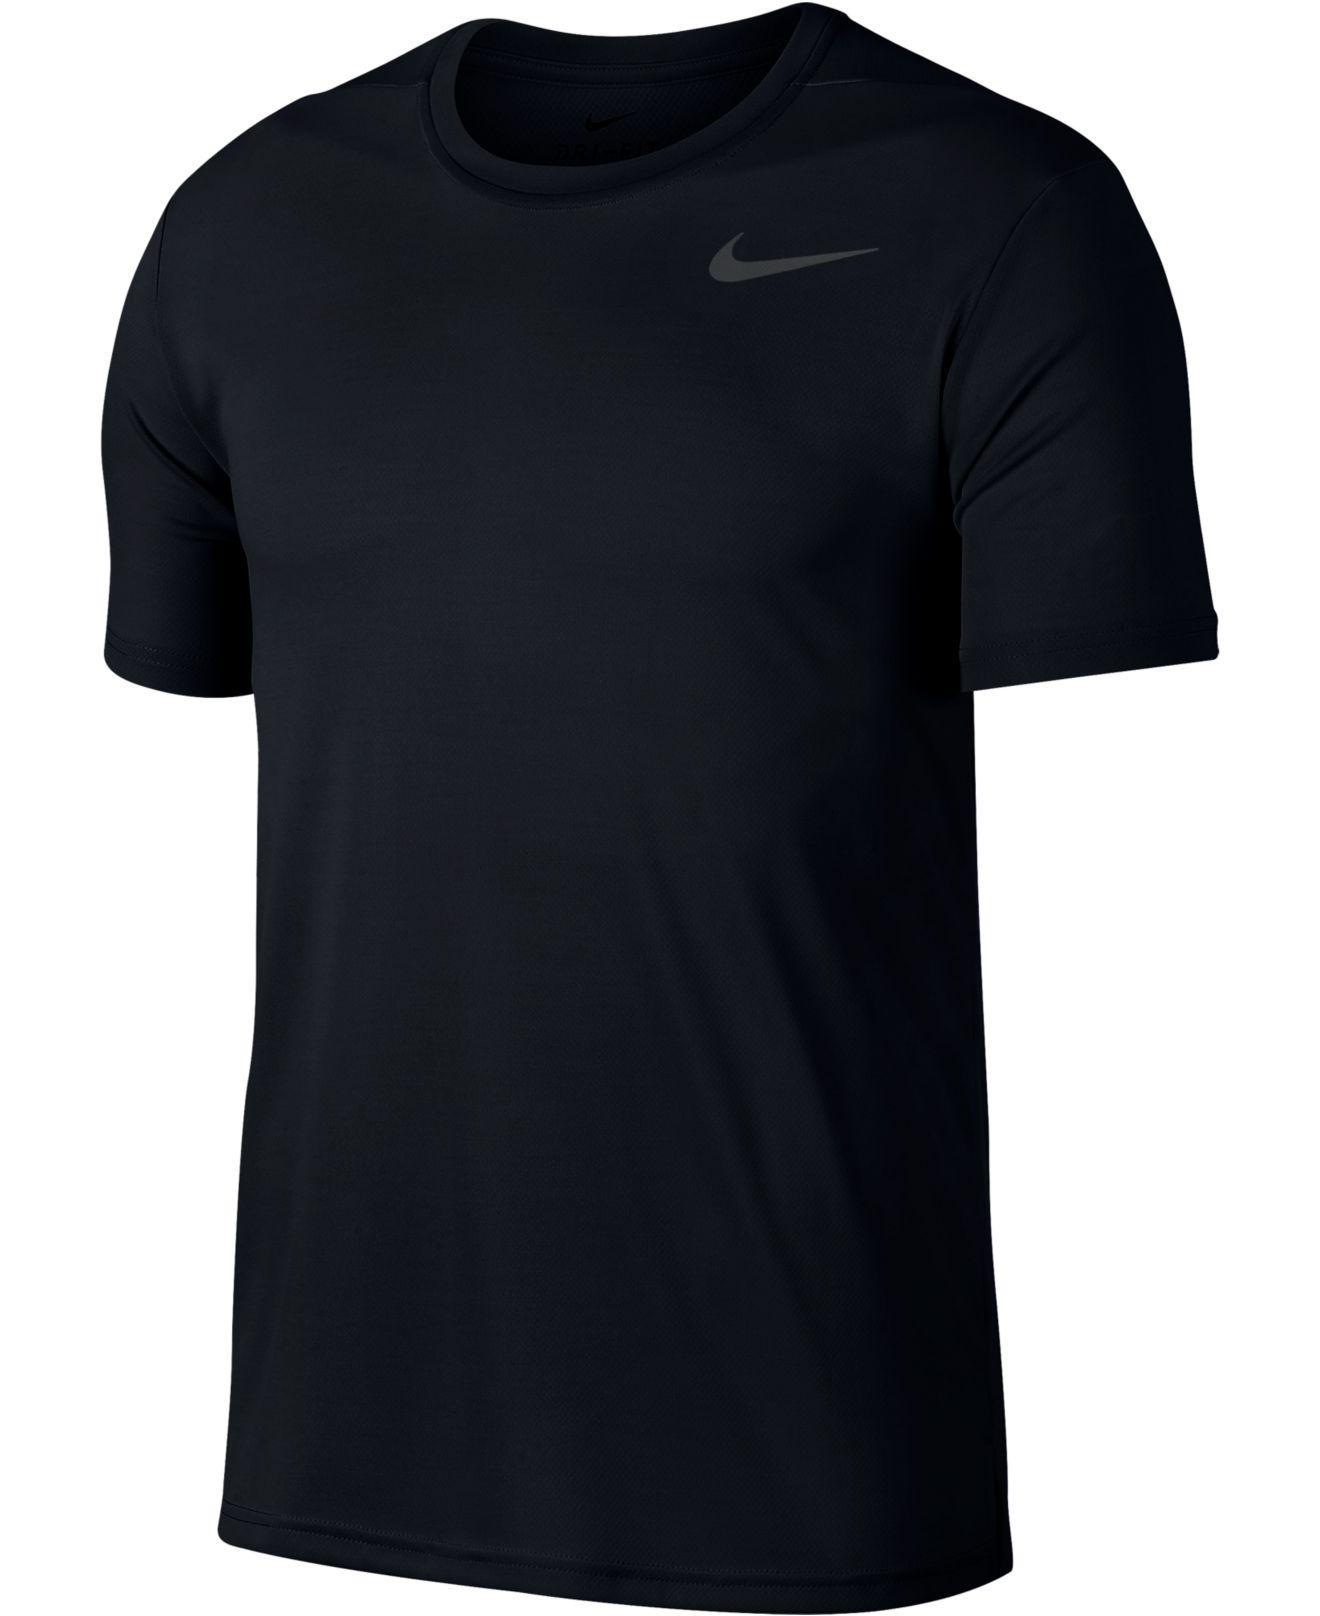 0935fedcc Lyst - Nike Superset Breathe Training Top in Black for Men